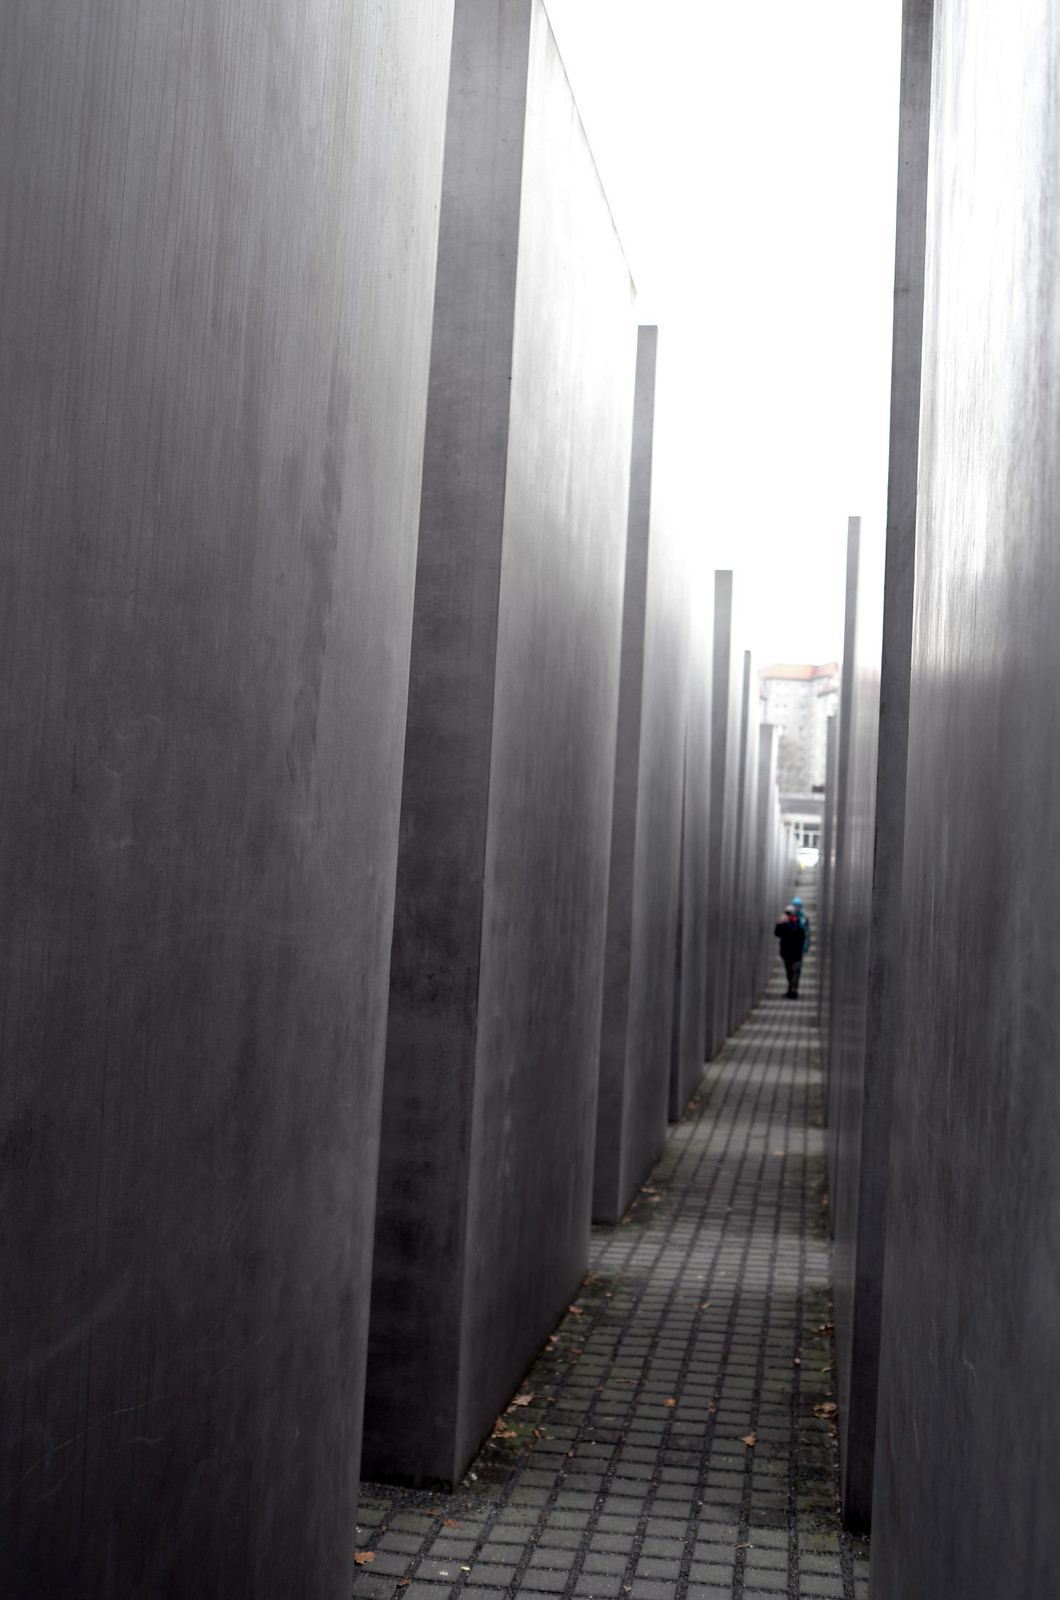 Berlin, the Capital